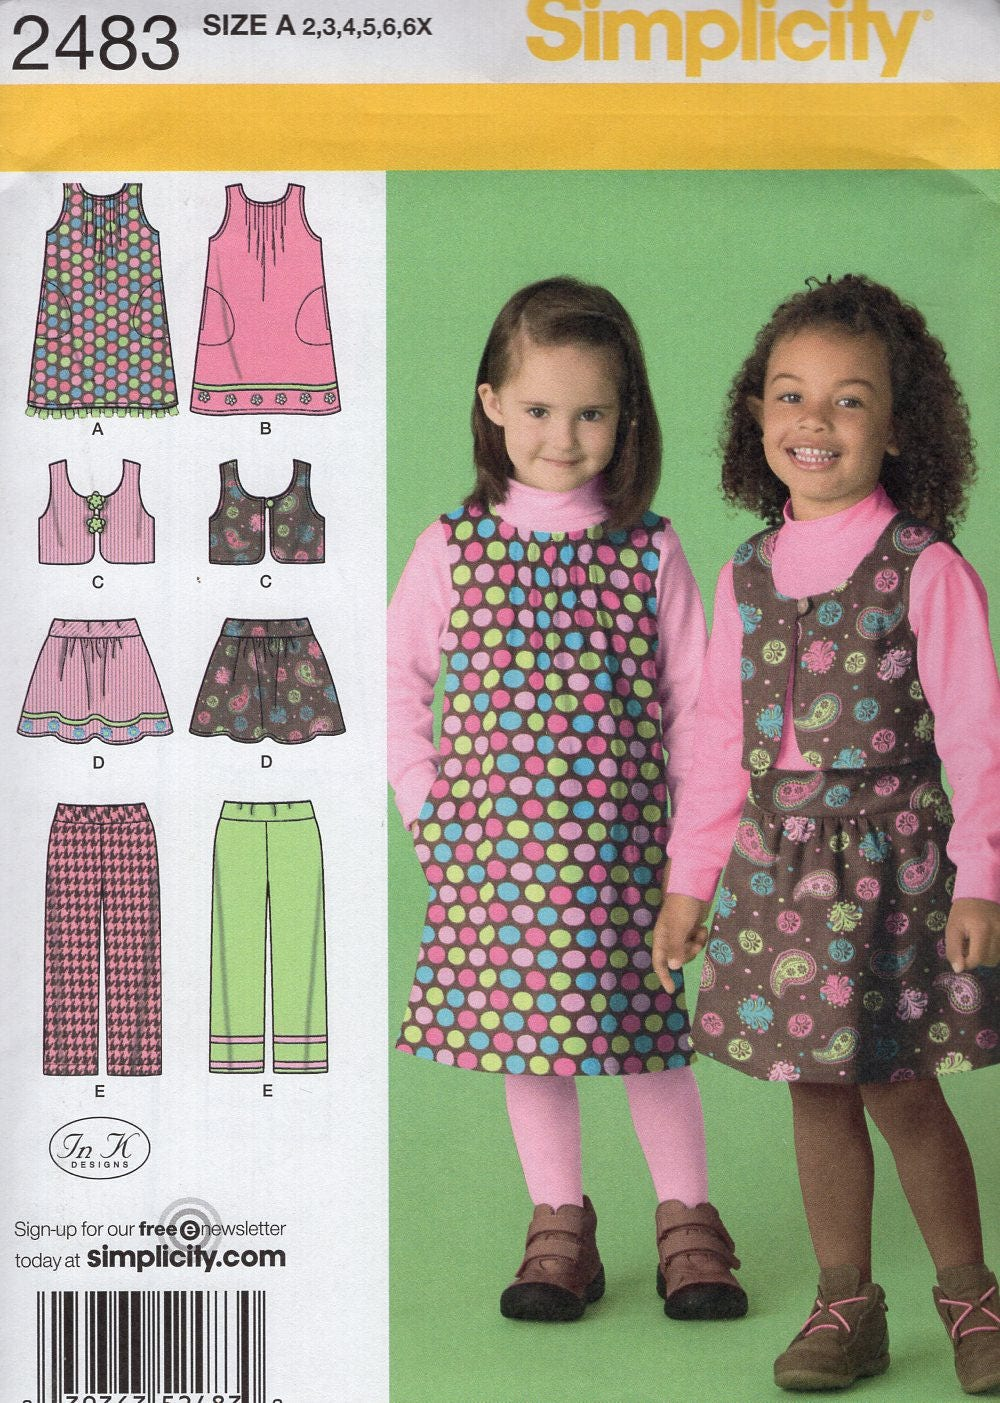 68799008f1052f ... Dress Pants Bolero In K Designs Size 2 3 4 5 6 6x Sewing Pattern Uncut  New. gallery photo gallery photo